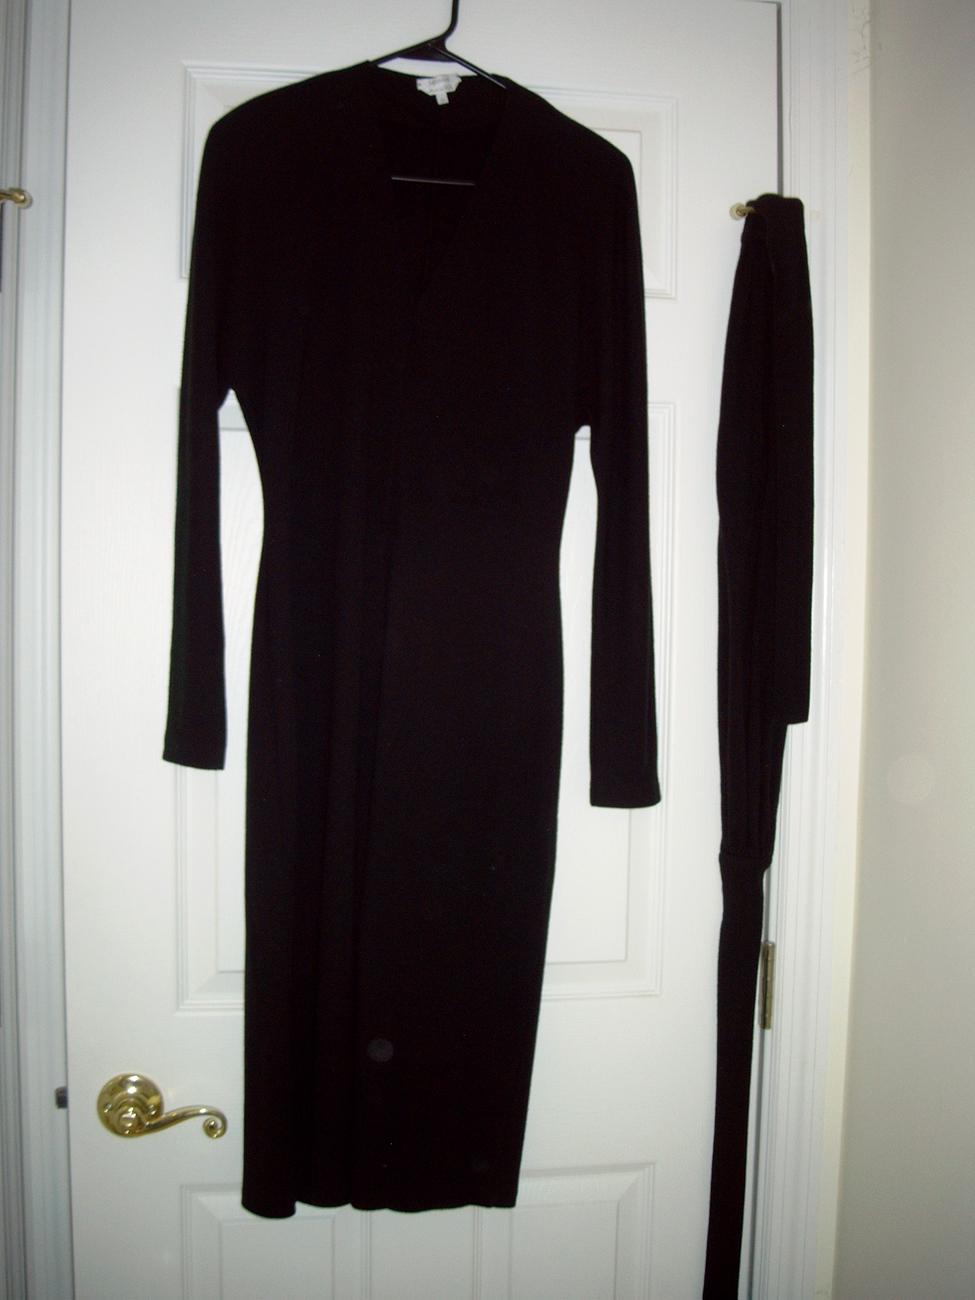 MAX MARA CLASSIC V-NECK BLACK WOOL FORMAL DRESS SIZE 38